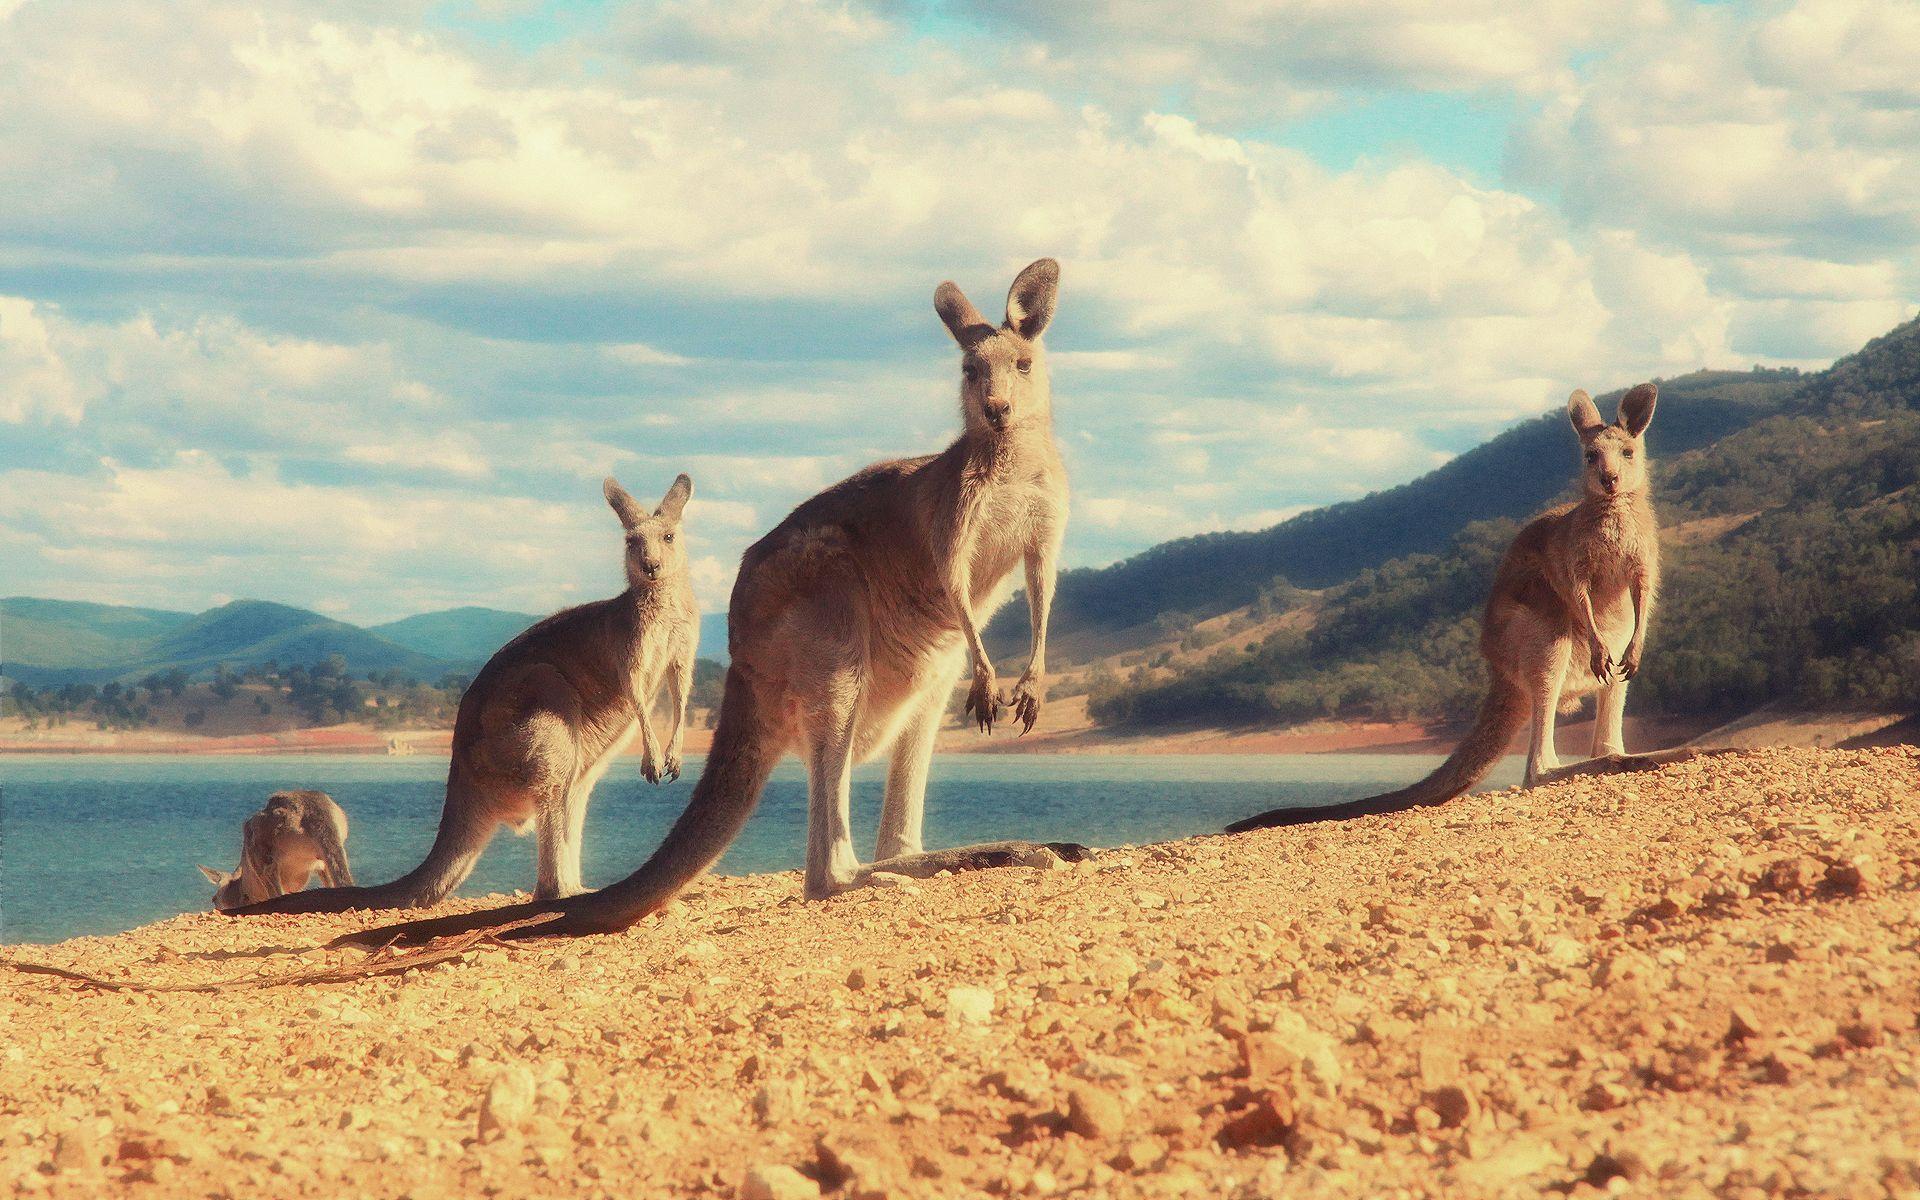 gambar kangguru wallpaper hd dari Berbagai Gambar Kanguru Lengkap di 2021    Kanguru, Gambar, Hewan